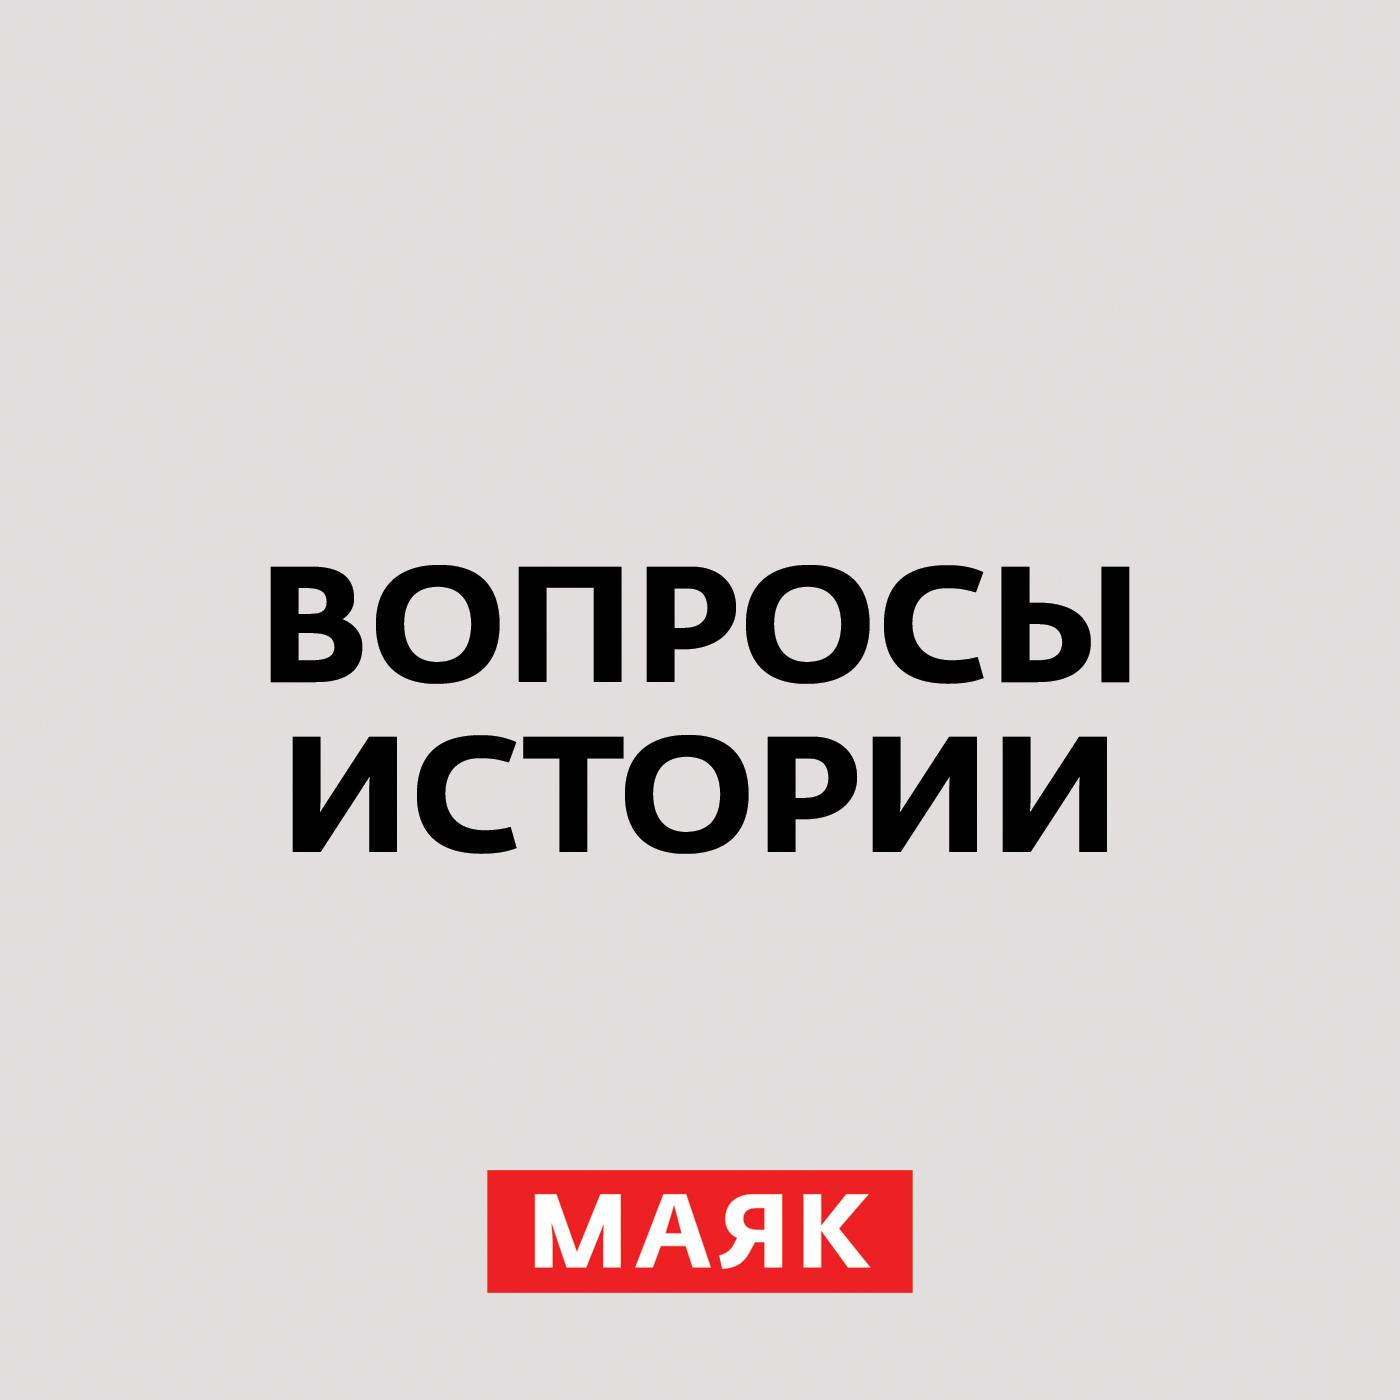 все цены на Андрей Светенко Демон революции Александр Парвус онлайн